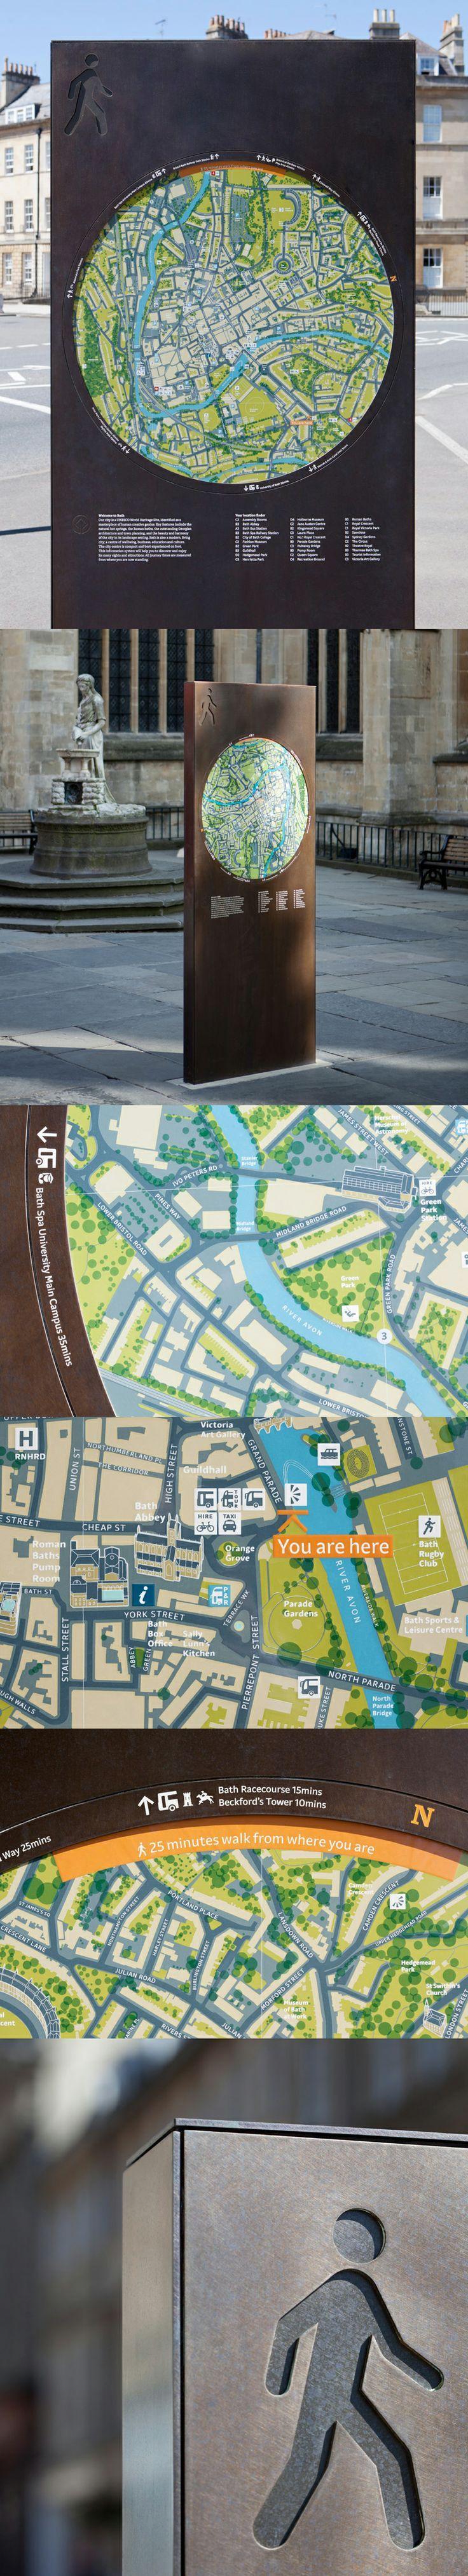 I love these Bath city wayfinding maps